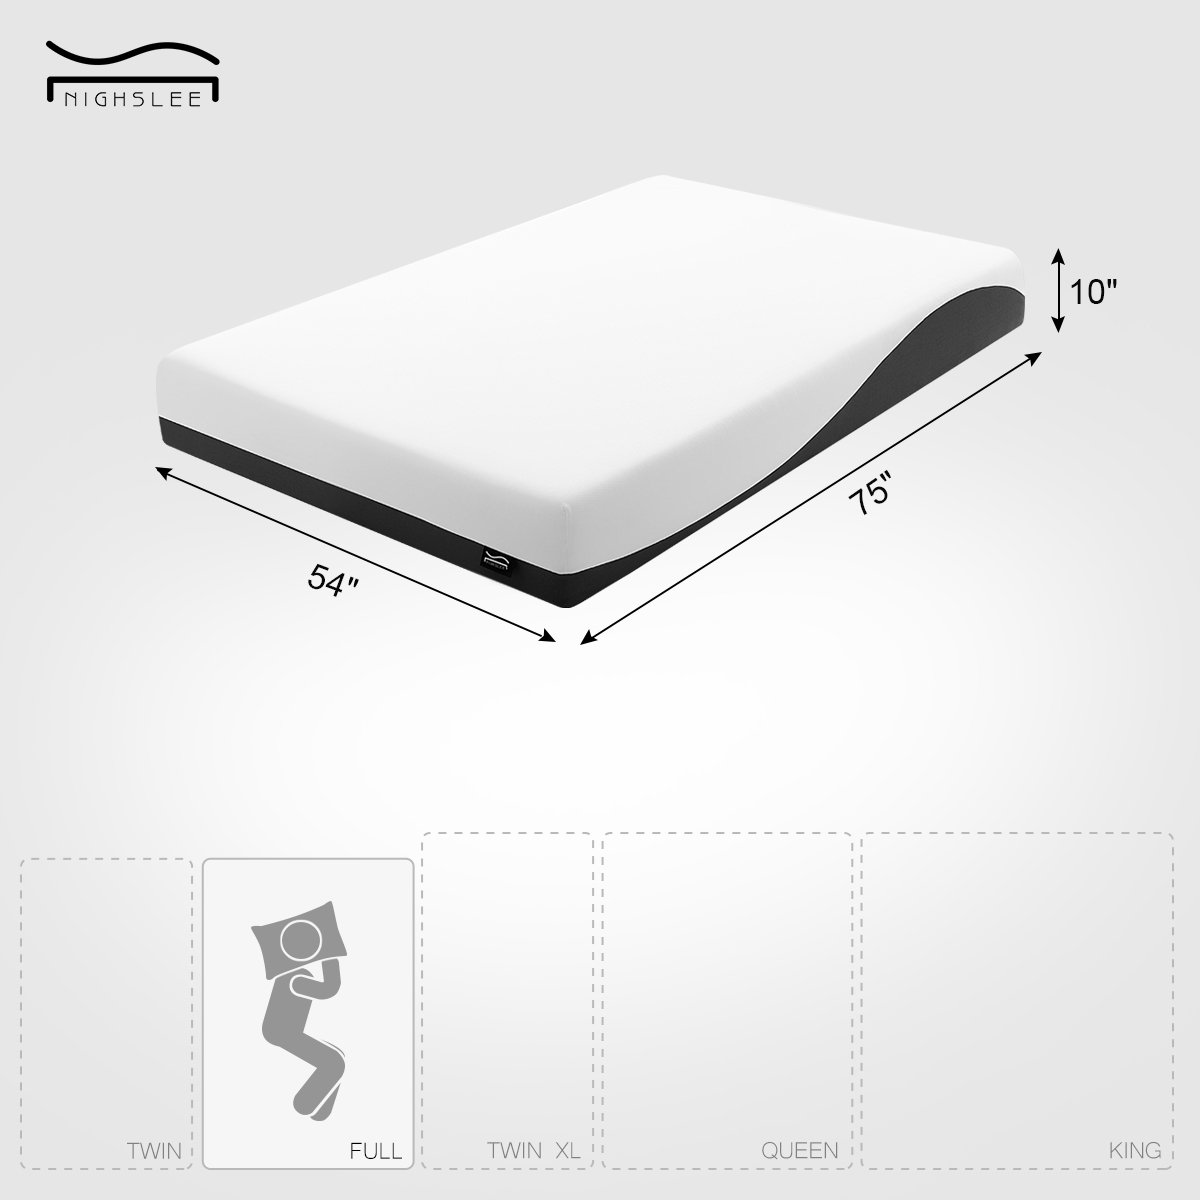 NIGHSLEE Memory Foam Mattress Full 10 Inch Patent Cooling Air Gel Comfort Foam – CertiPUR-US Certified – 10-Year Warranty